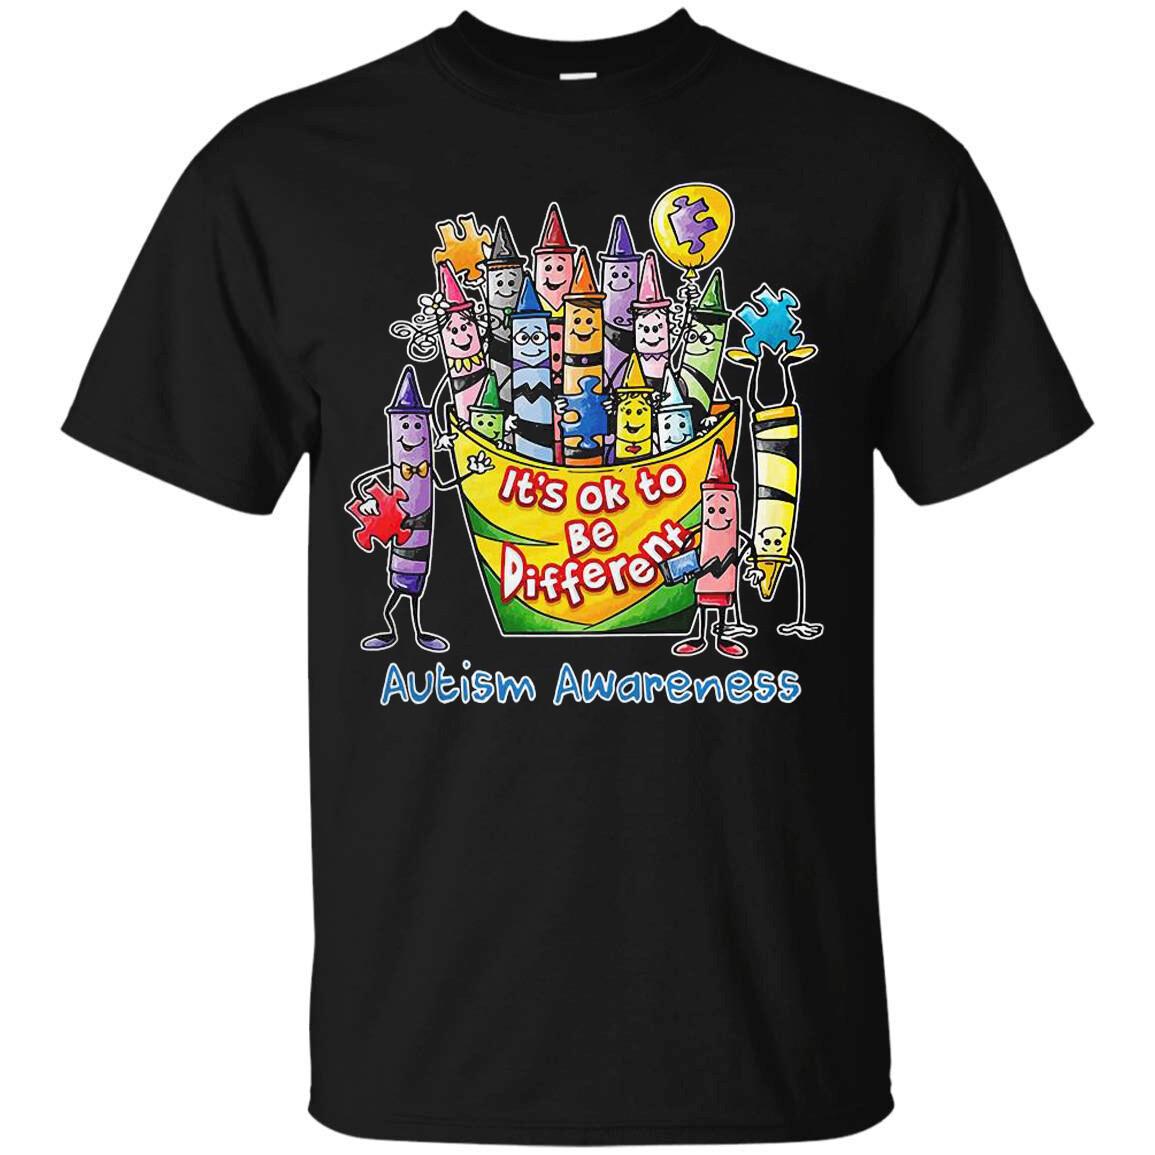 Costcotee Cool Autism Awareness Crayons It's Ok To Be Different Shirt Short-Sleeve Long-Sleeve V-Neck Tank Hoodie Sweatshirt Men Women Tee Gift